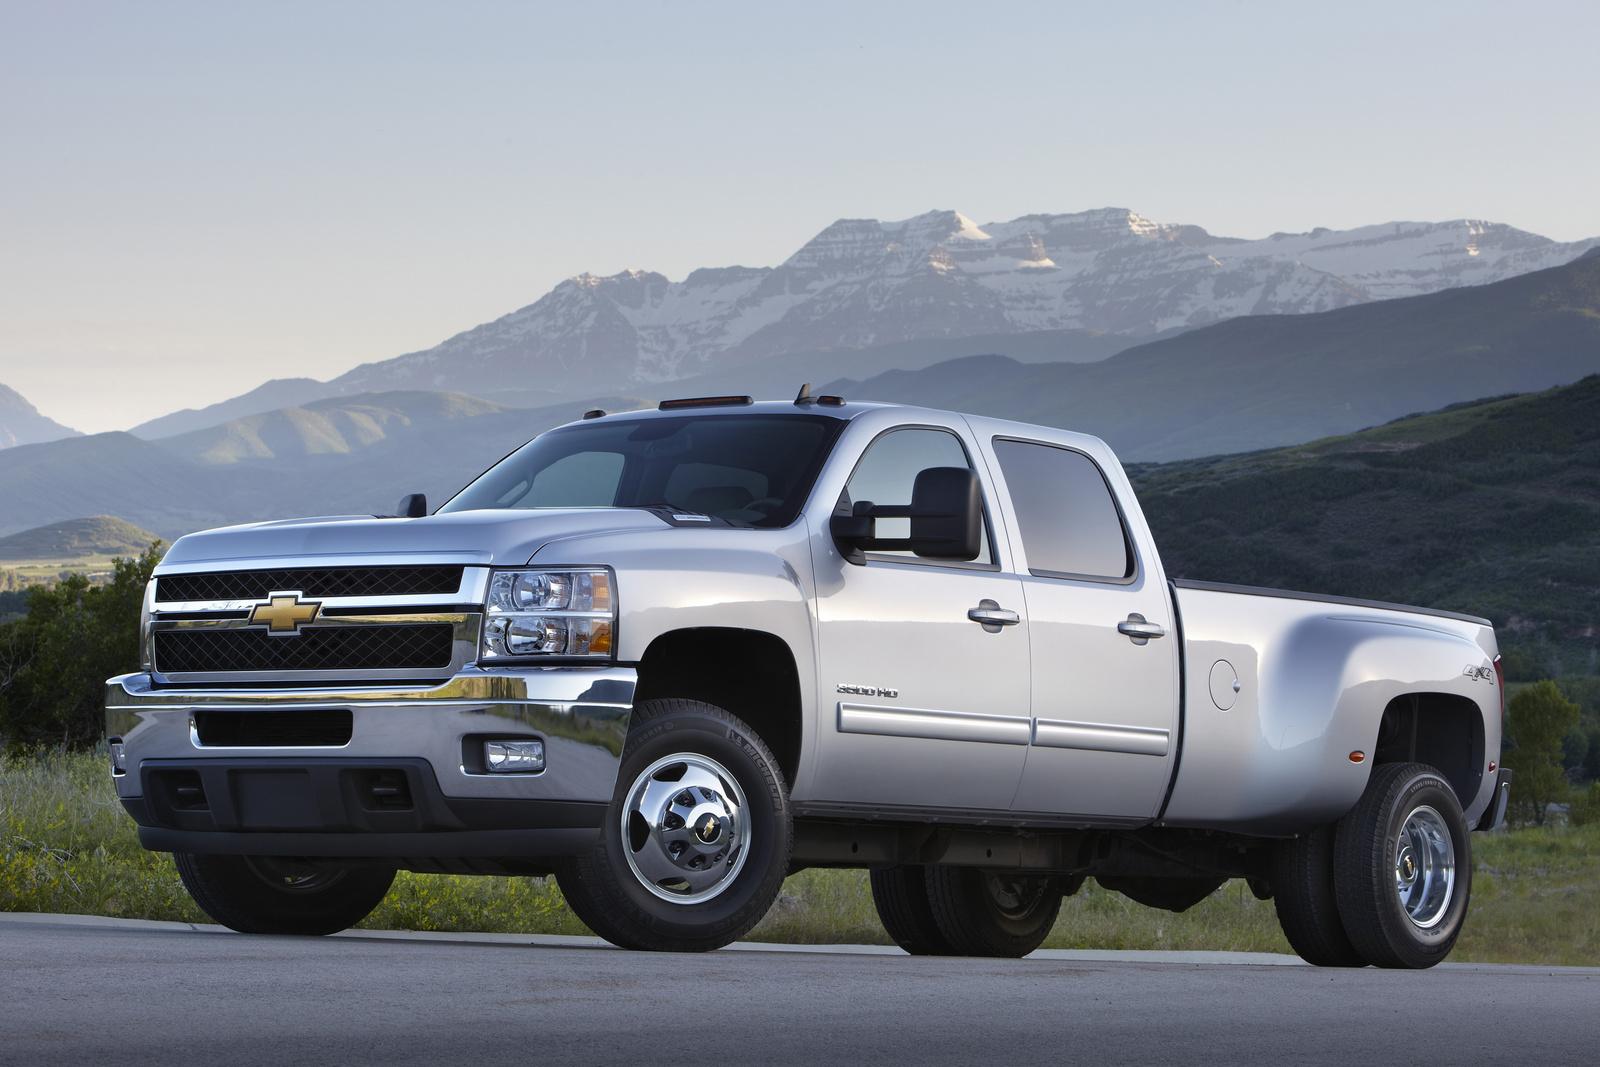 Chevy Silverado – One in a Rich History of Pickup Trucks   Jessup Auto Plaza Automotive Blog